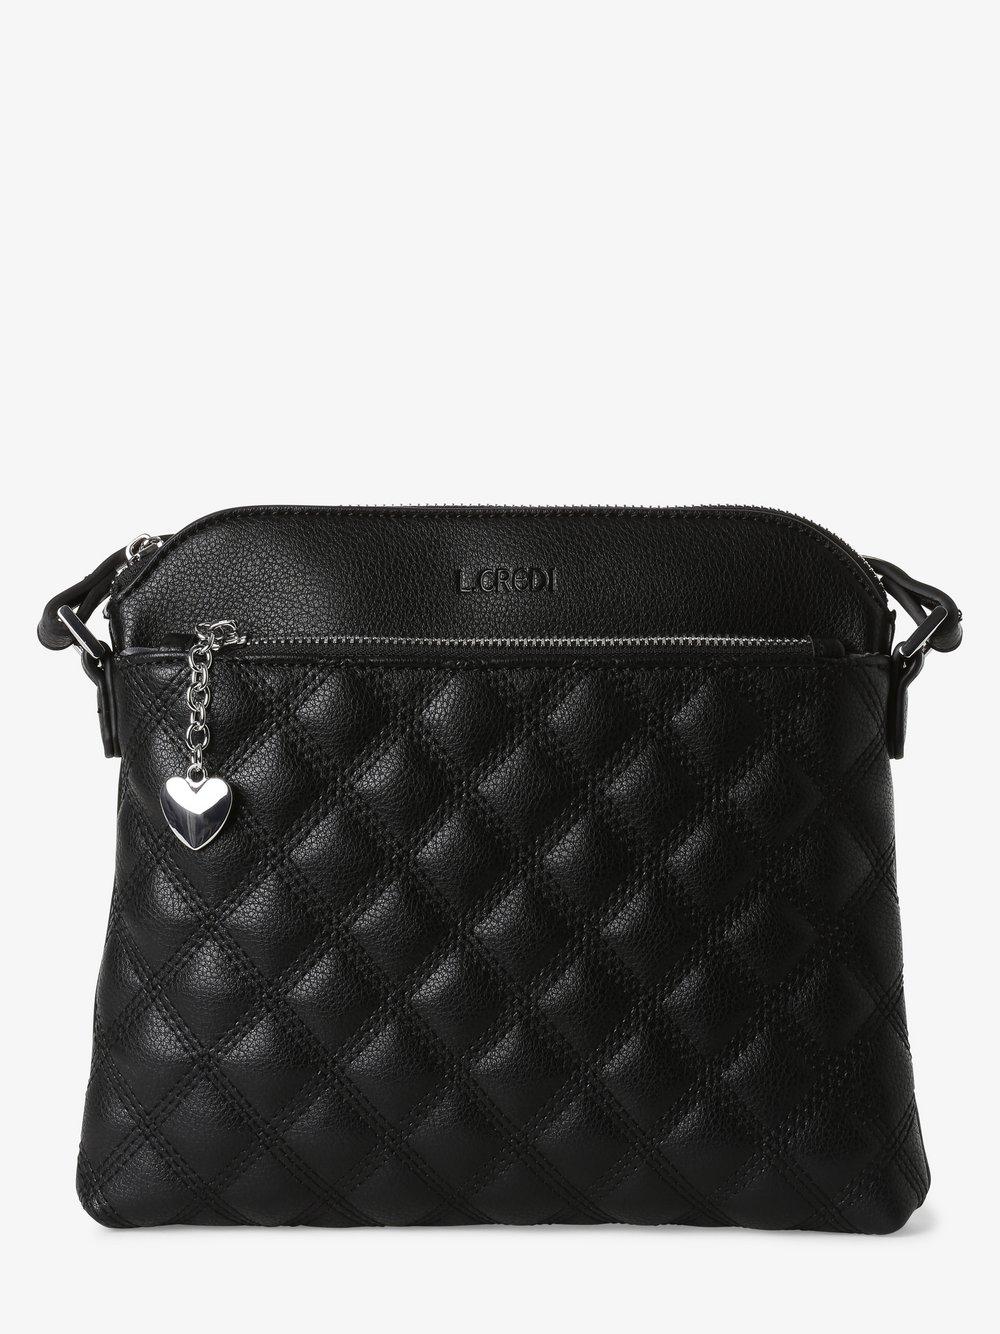 L.Credi - Damska torebka na ramię – Giulietta, czarny